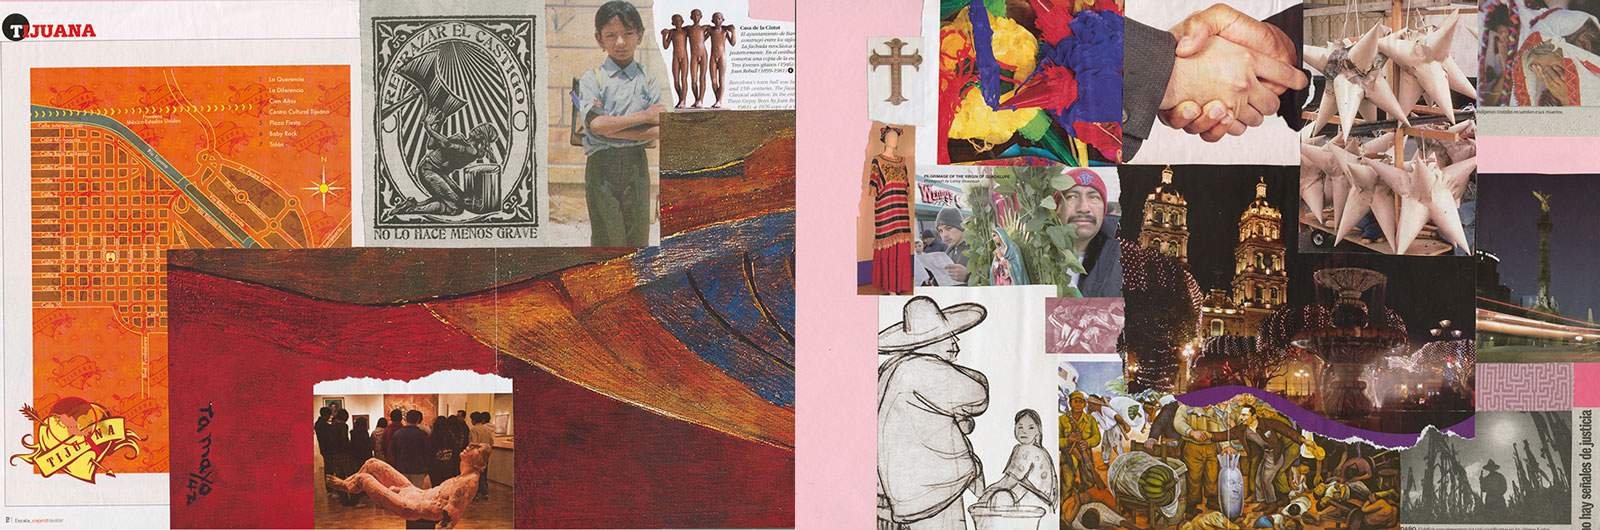 Deborah-Koenker-Visual-Artist_Mexico-lindo